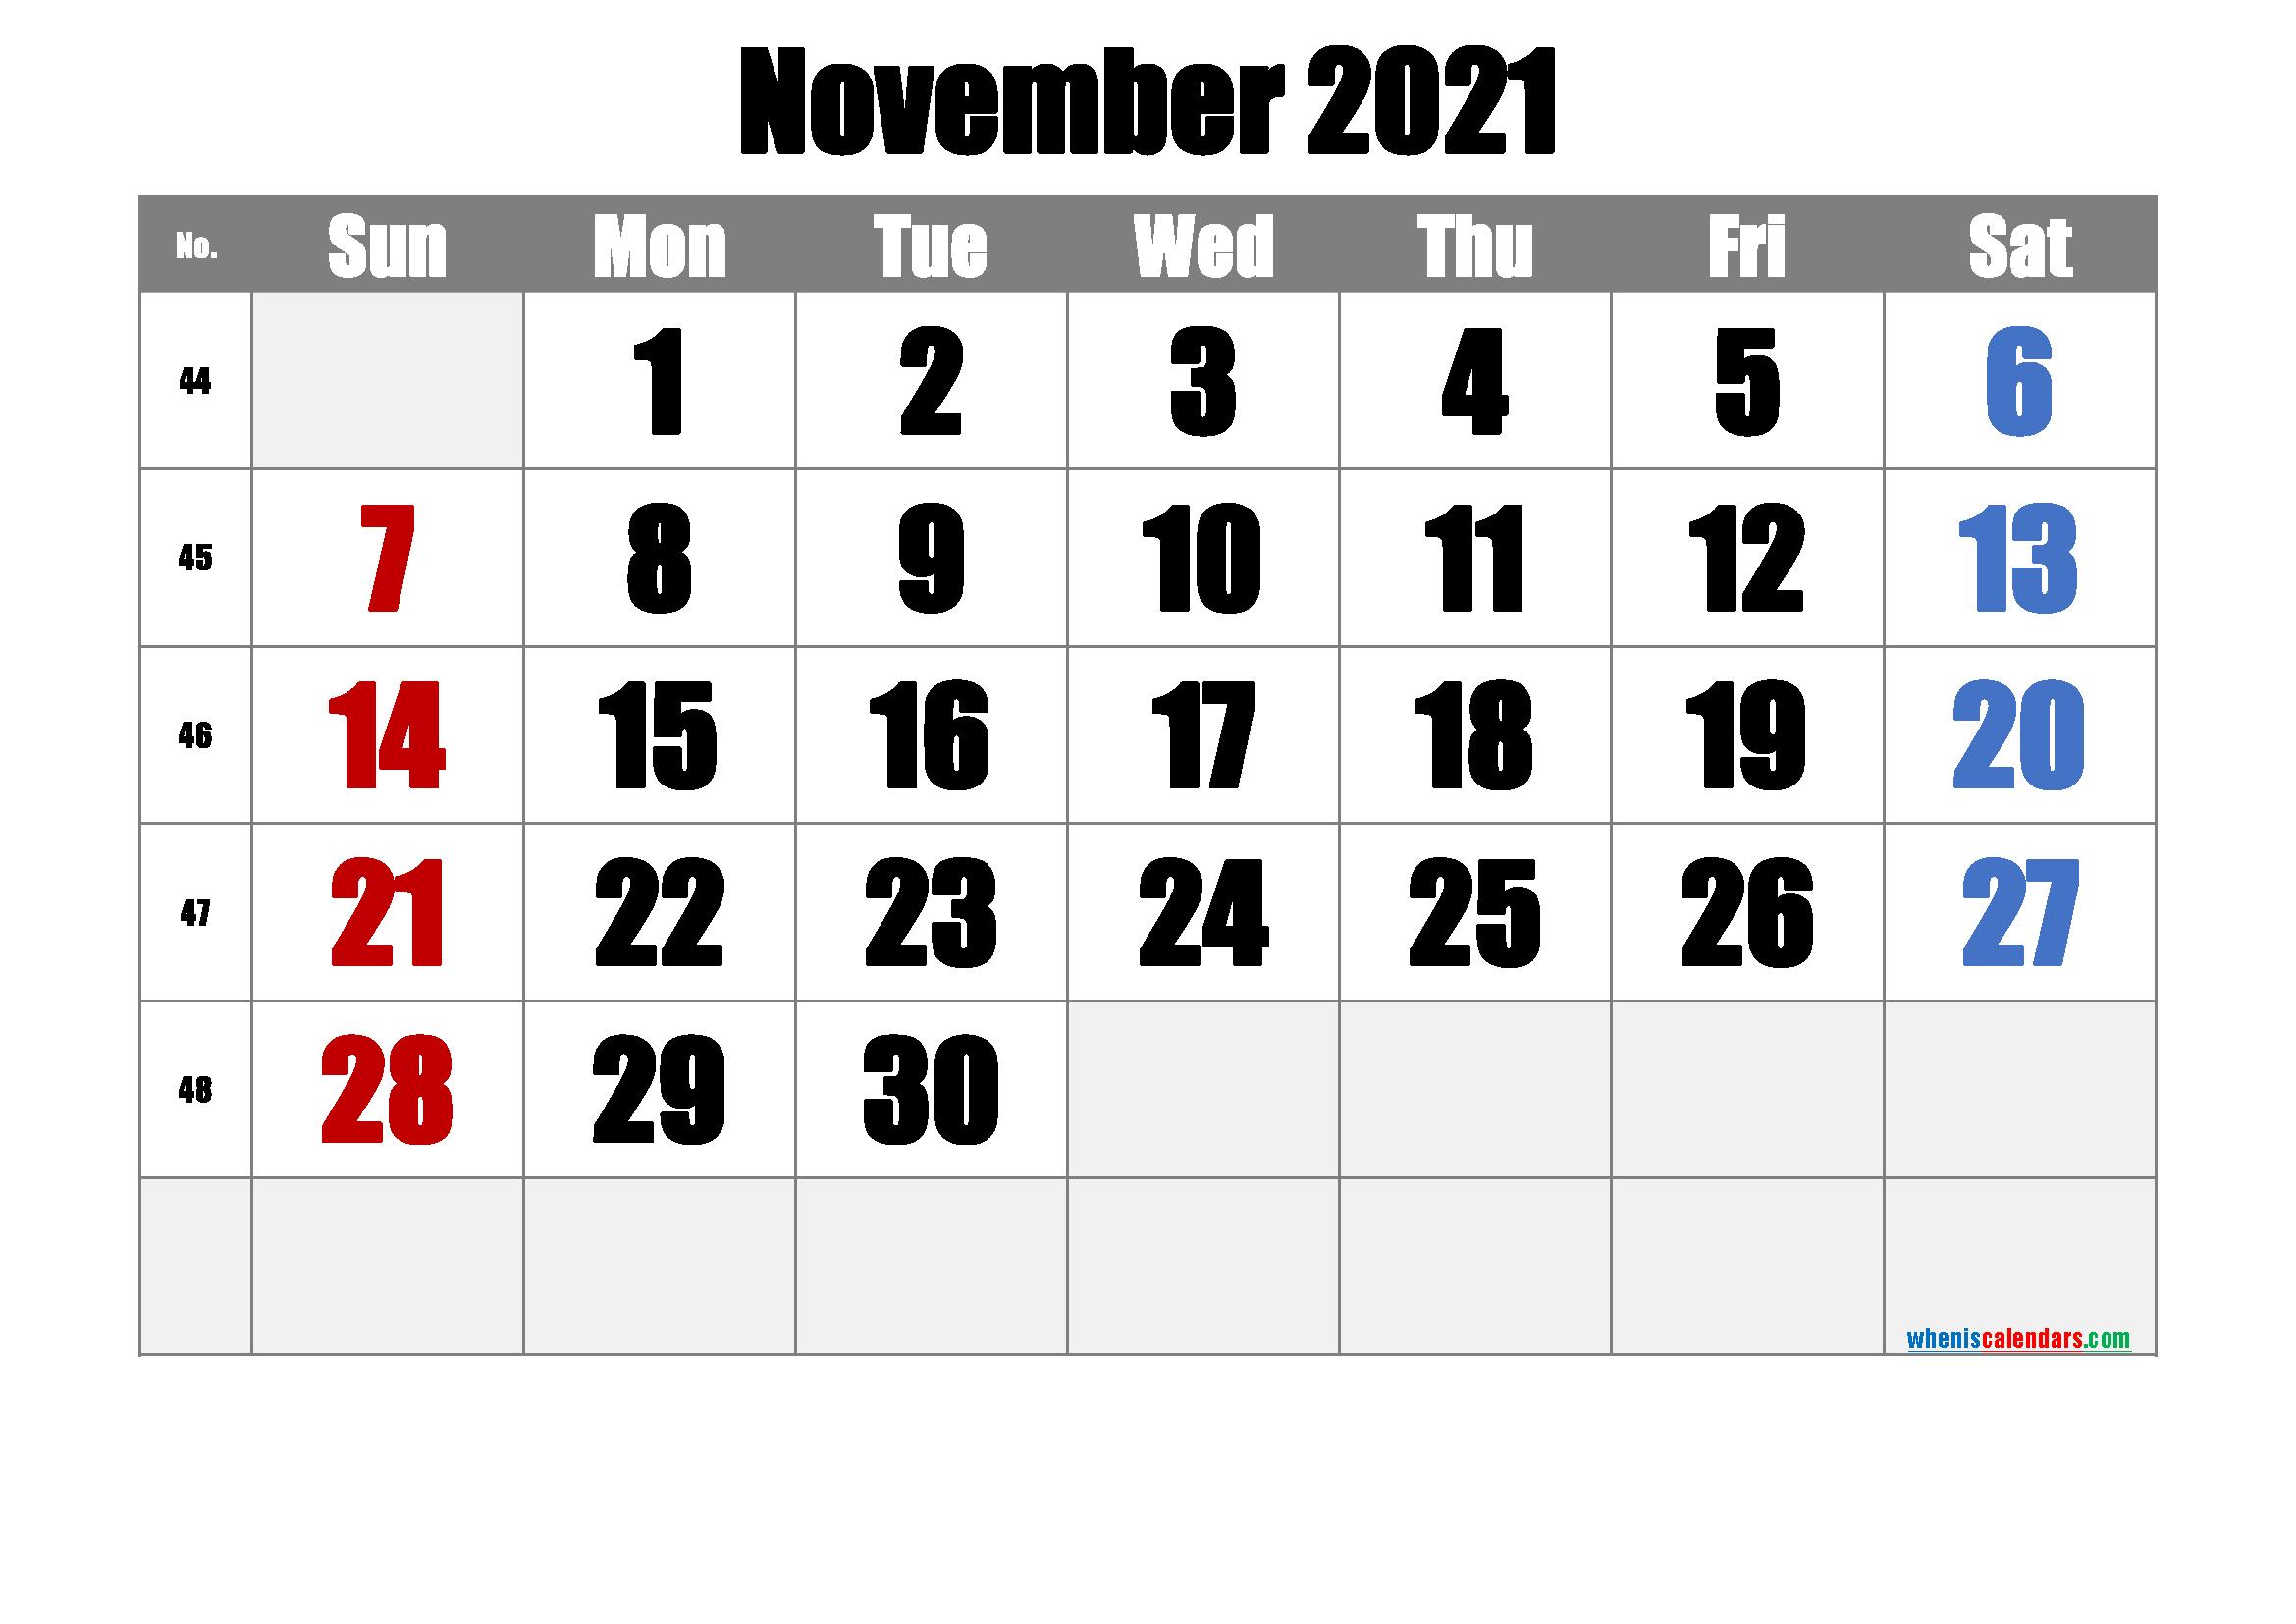 20+ November 2021 Calendar - Free Download Printable